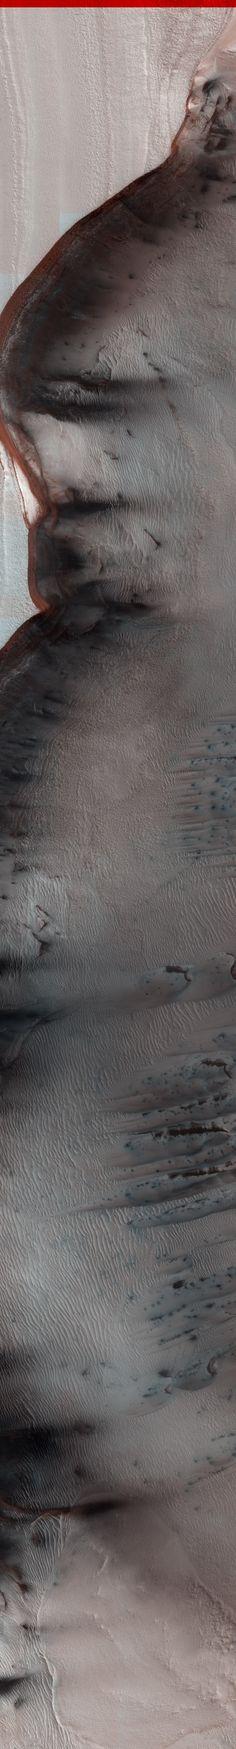 NASA/JPL/University of Arizona MARS North Polar Scarp in Abalos Undae with Basal Exposure and Dunes